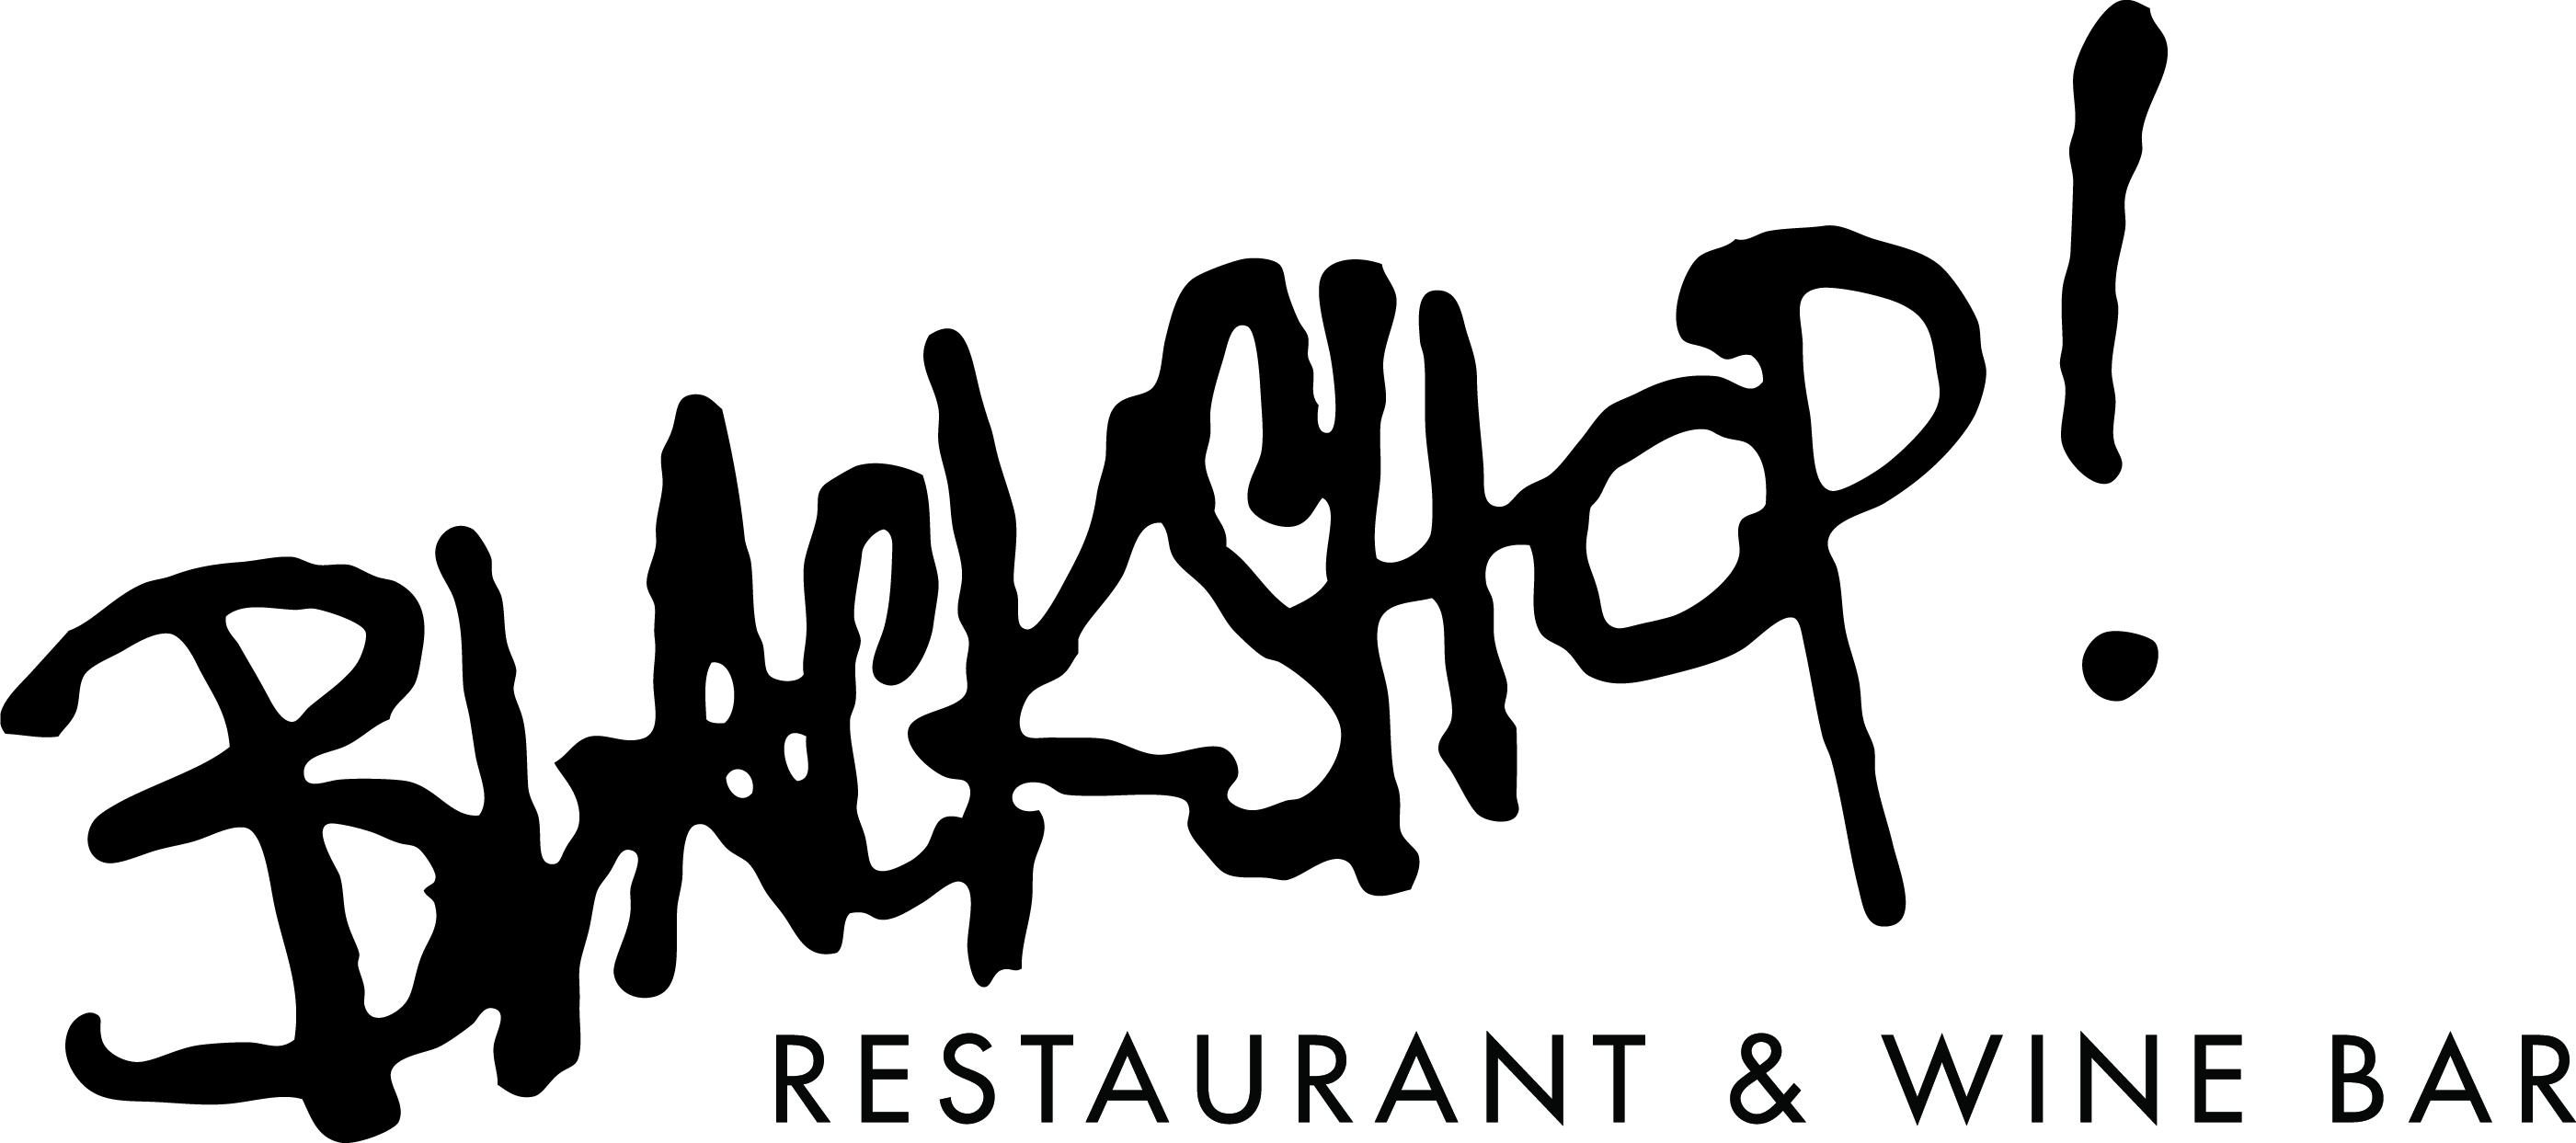 Blackshop Logo